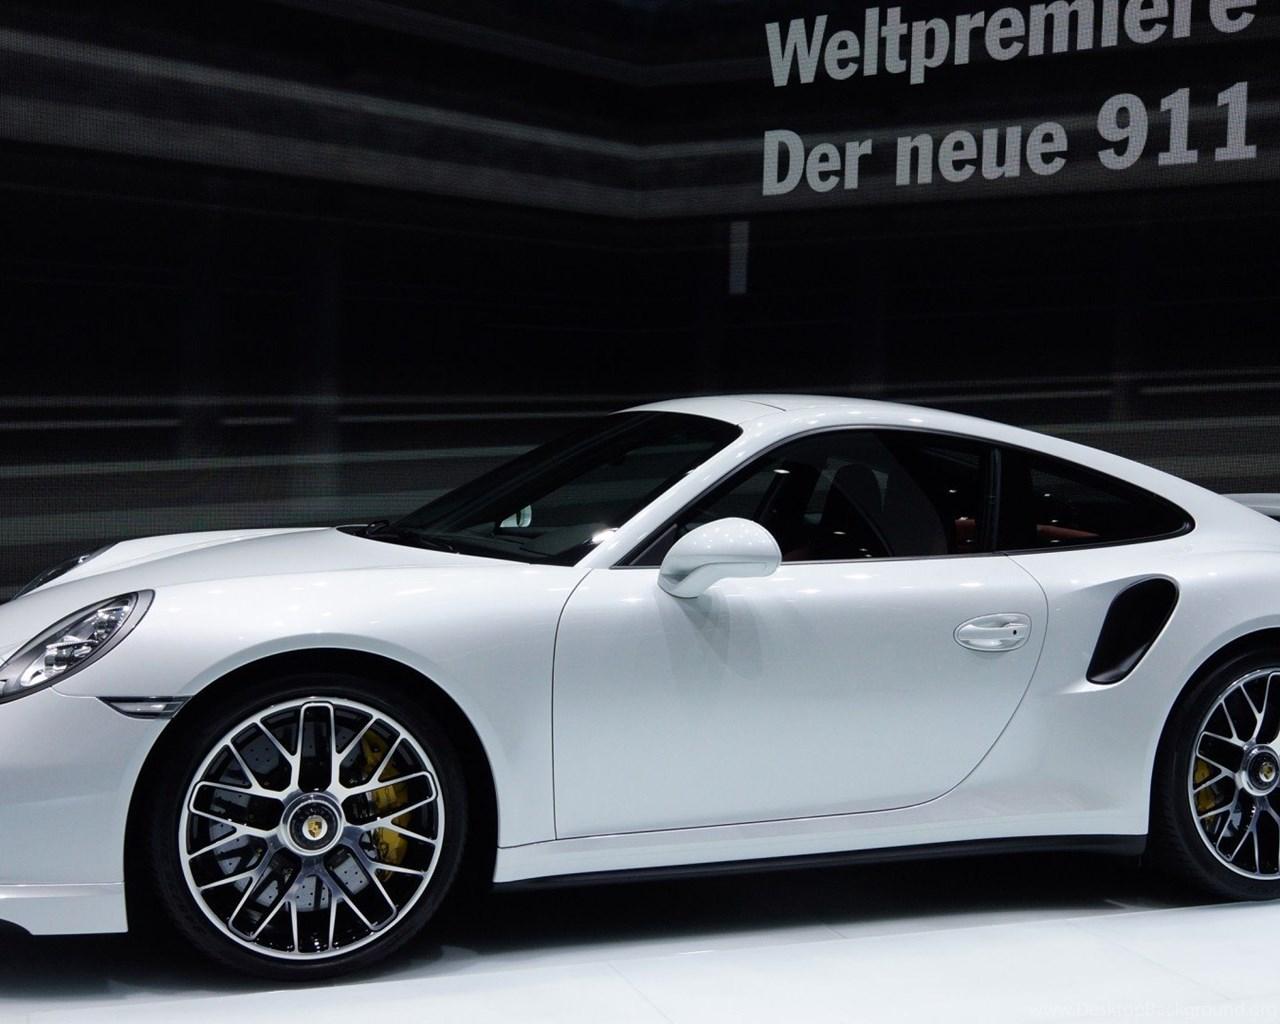 2016 Porsche 911 Turbo S Interior Archives Vehicle Wallpapers Desktop Background